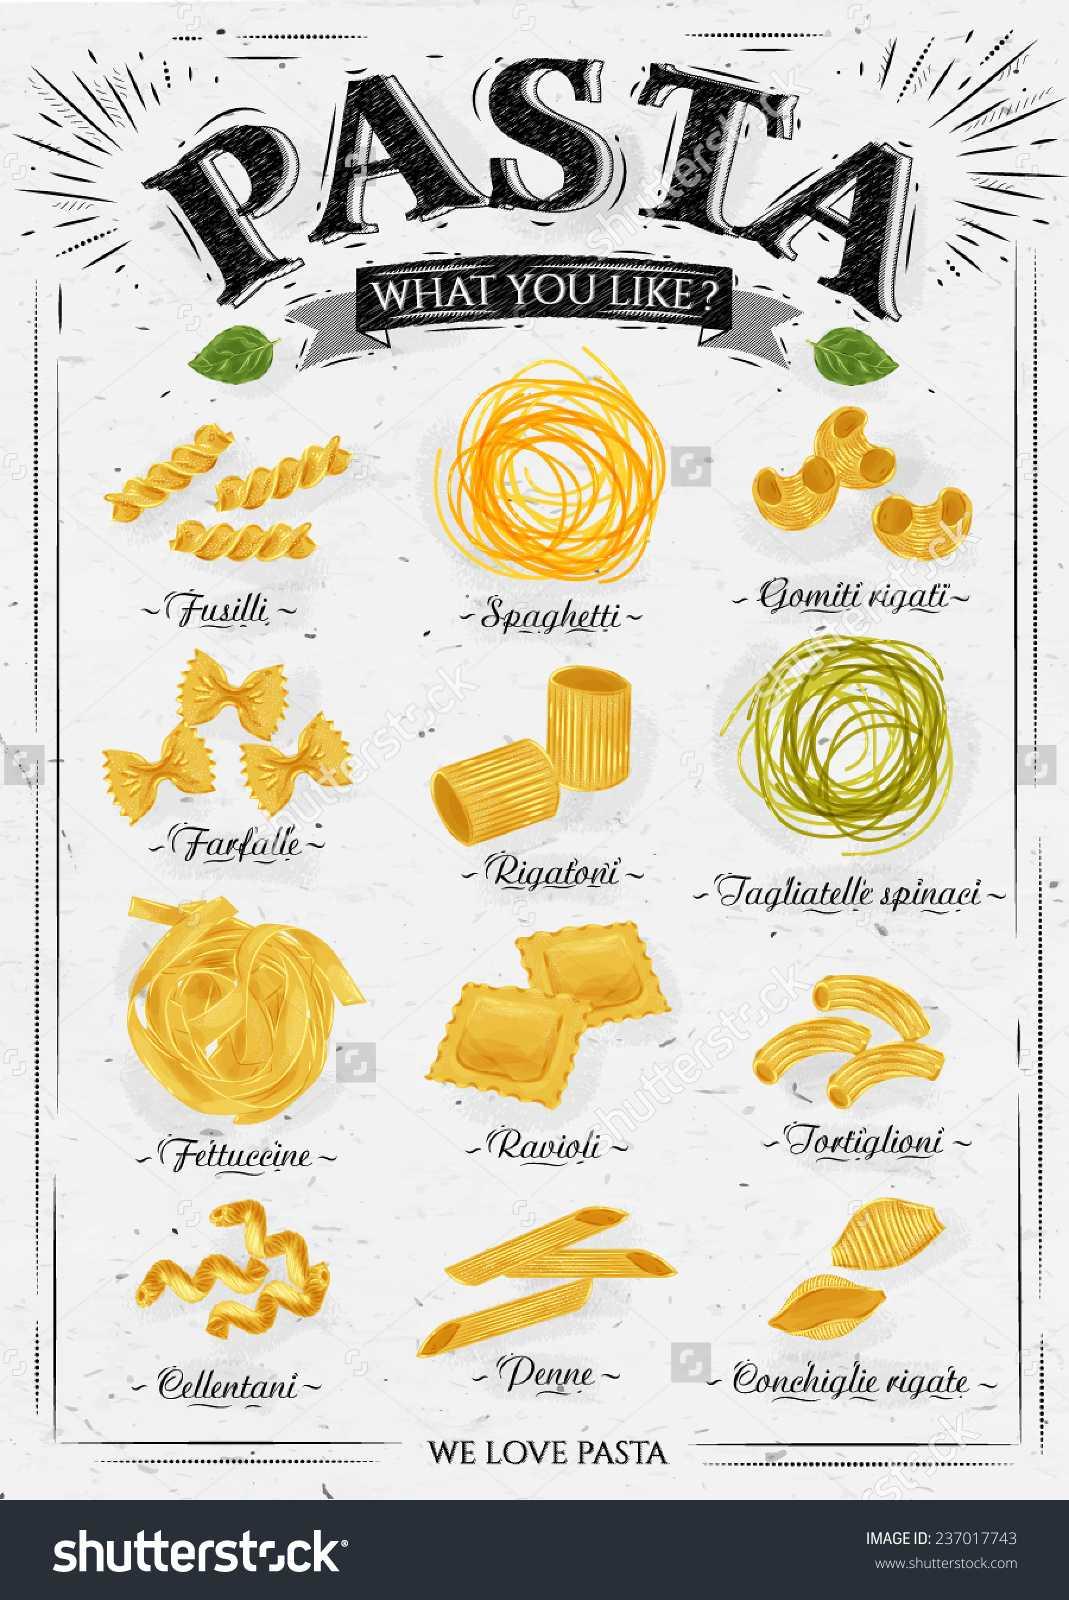 Types of pasta-fnbworld